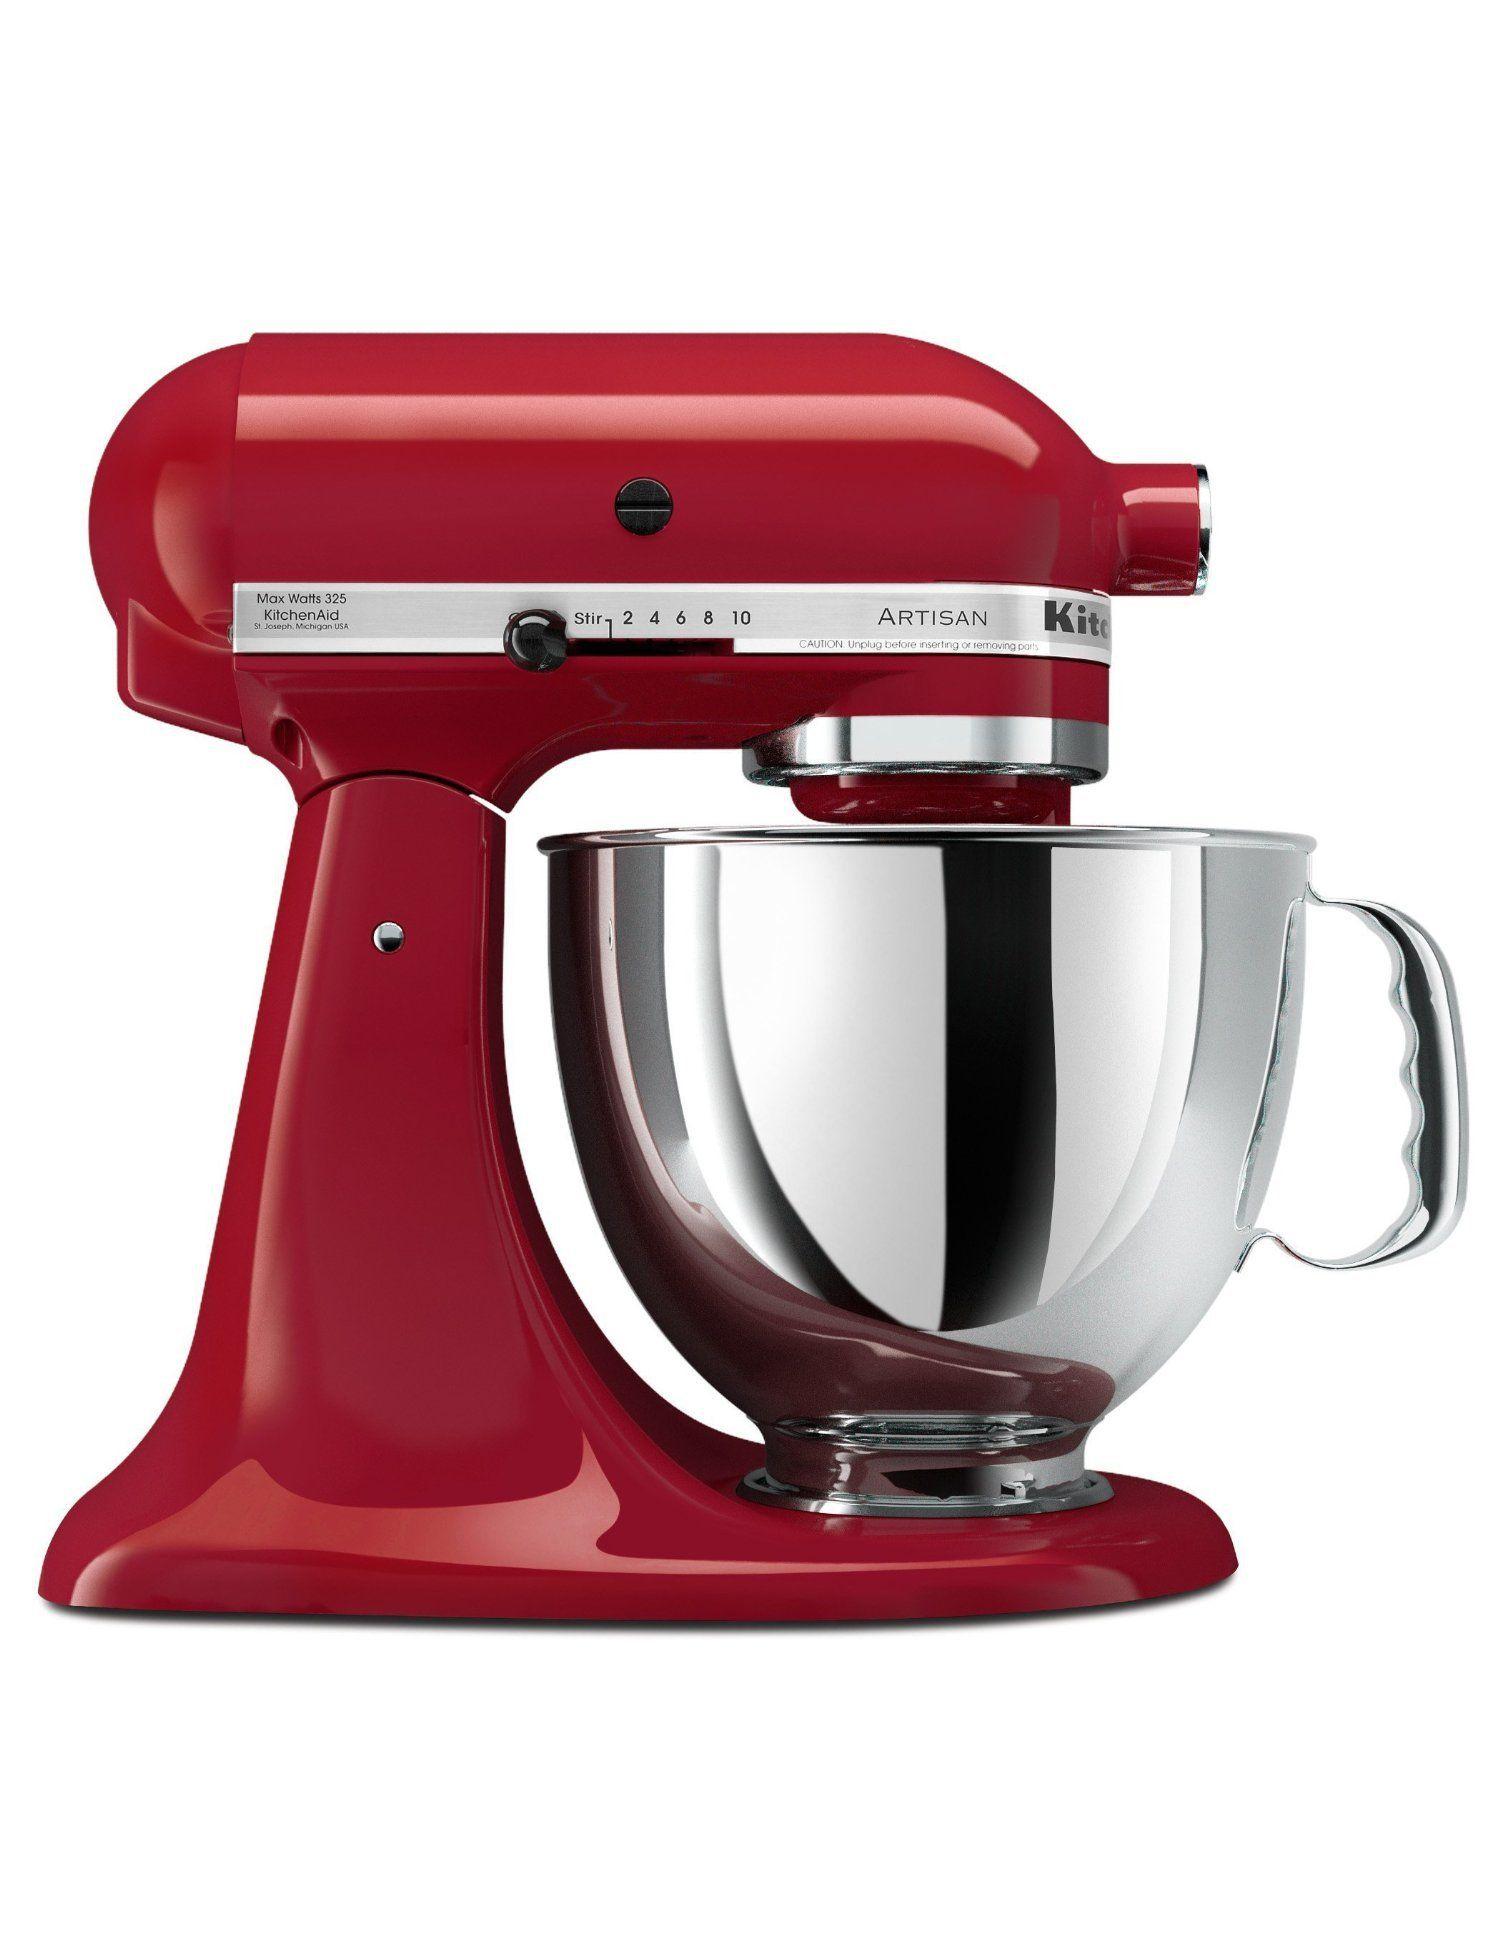 red kitchen aid mixer ksmpca kitchen aid qt mixer red popup home